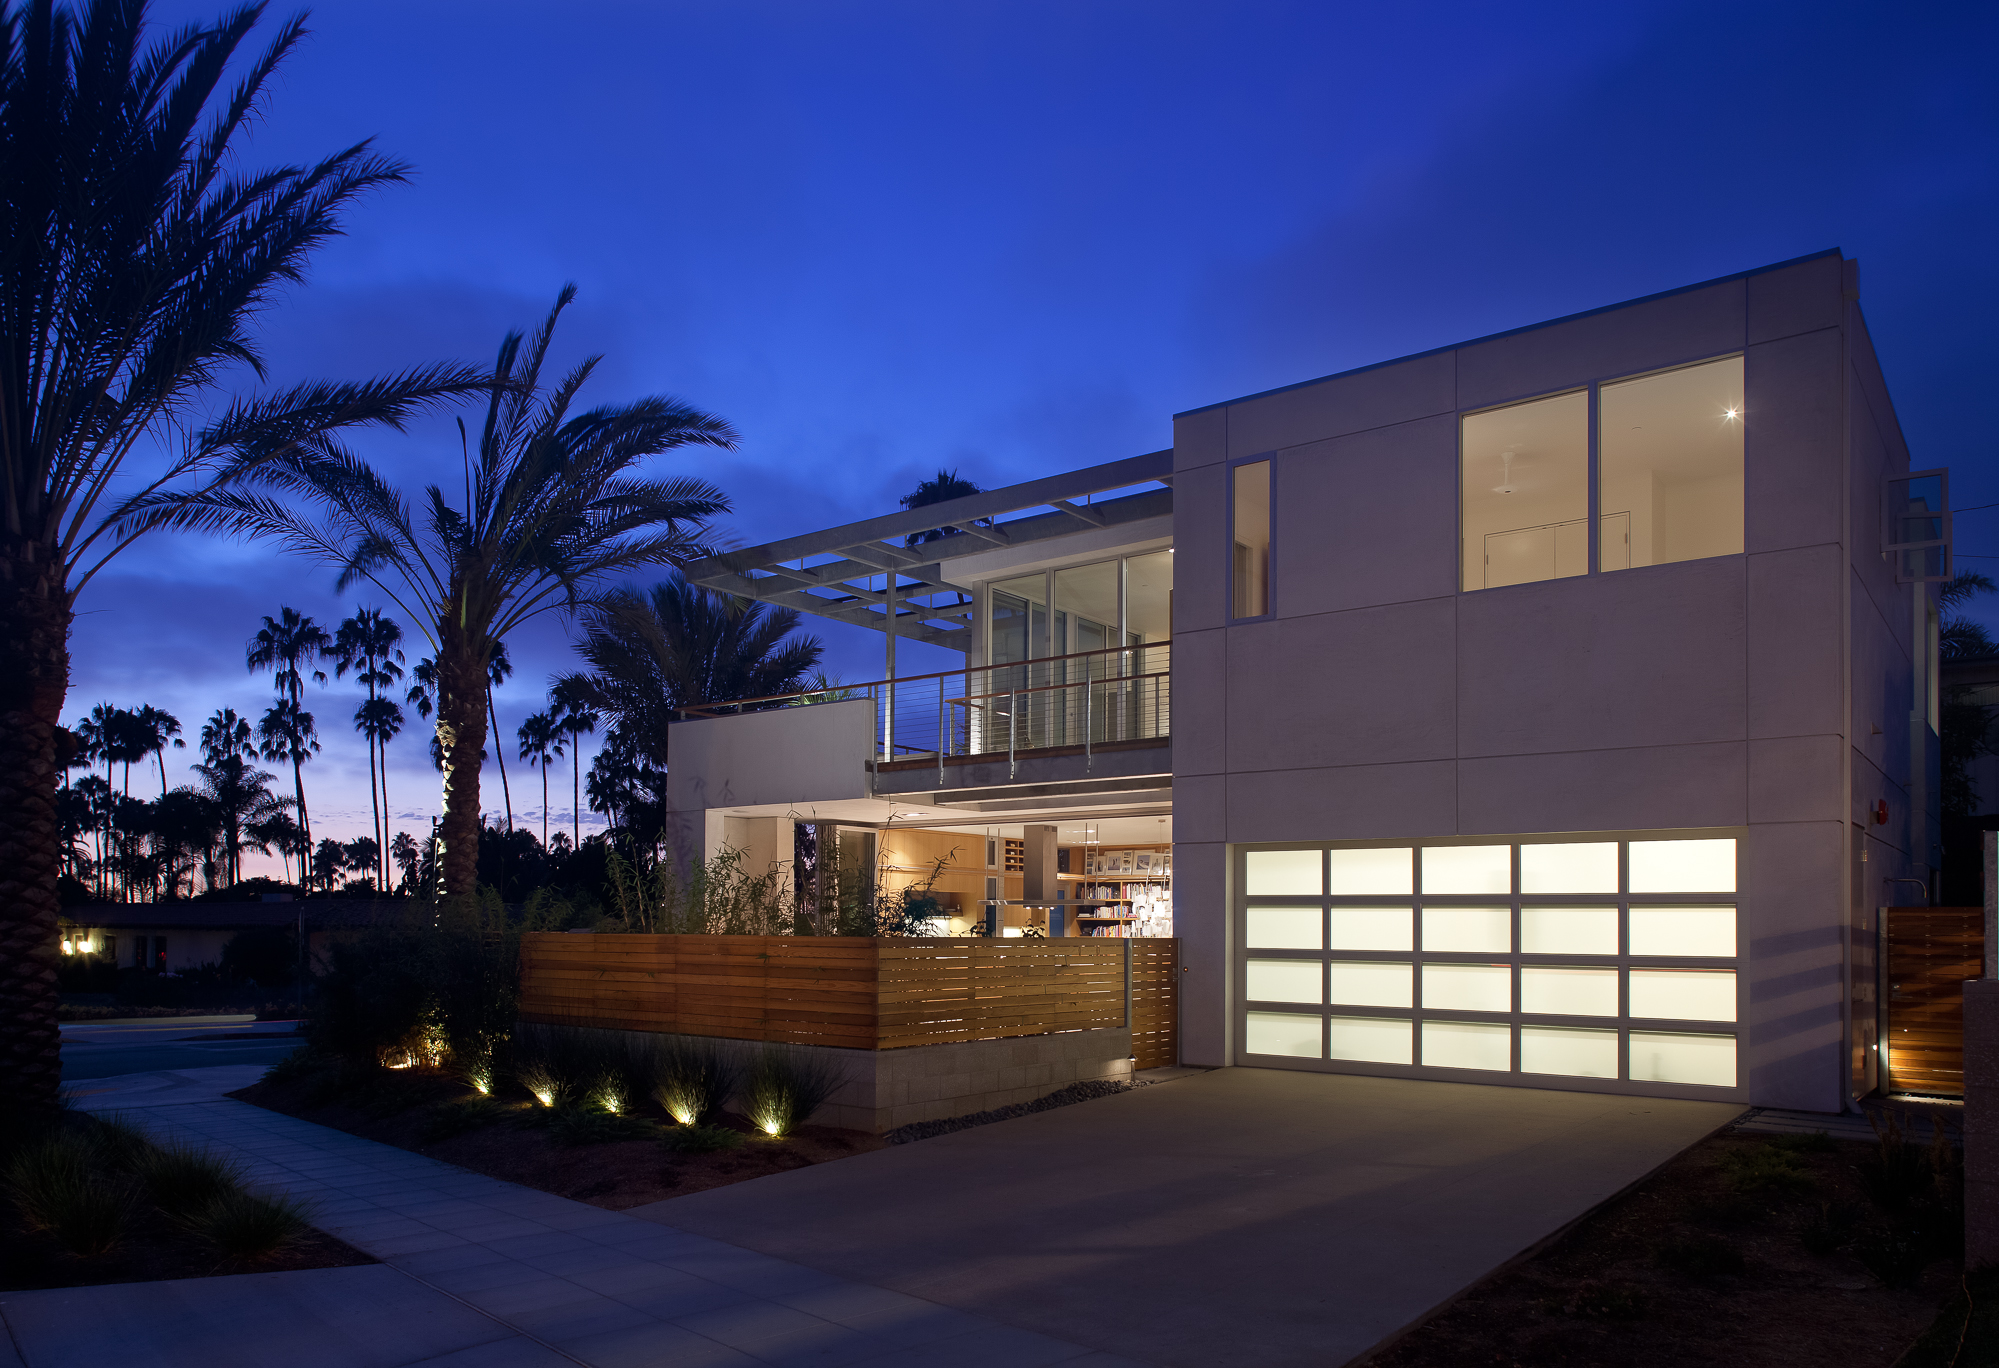 Design architecture awards domusstudio architecture for Beach house design awards